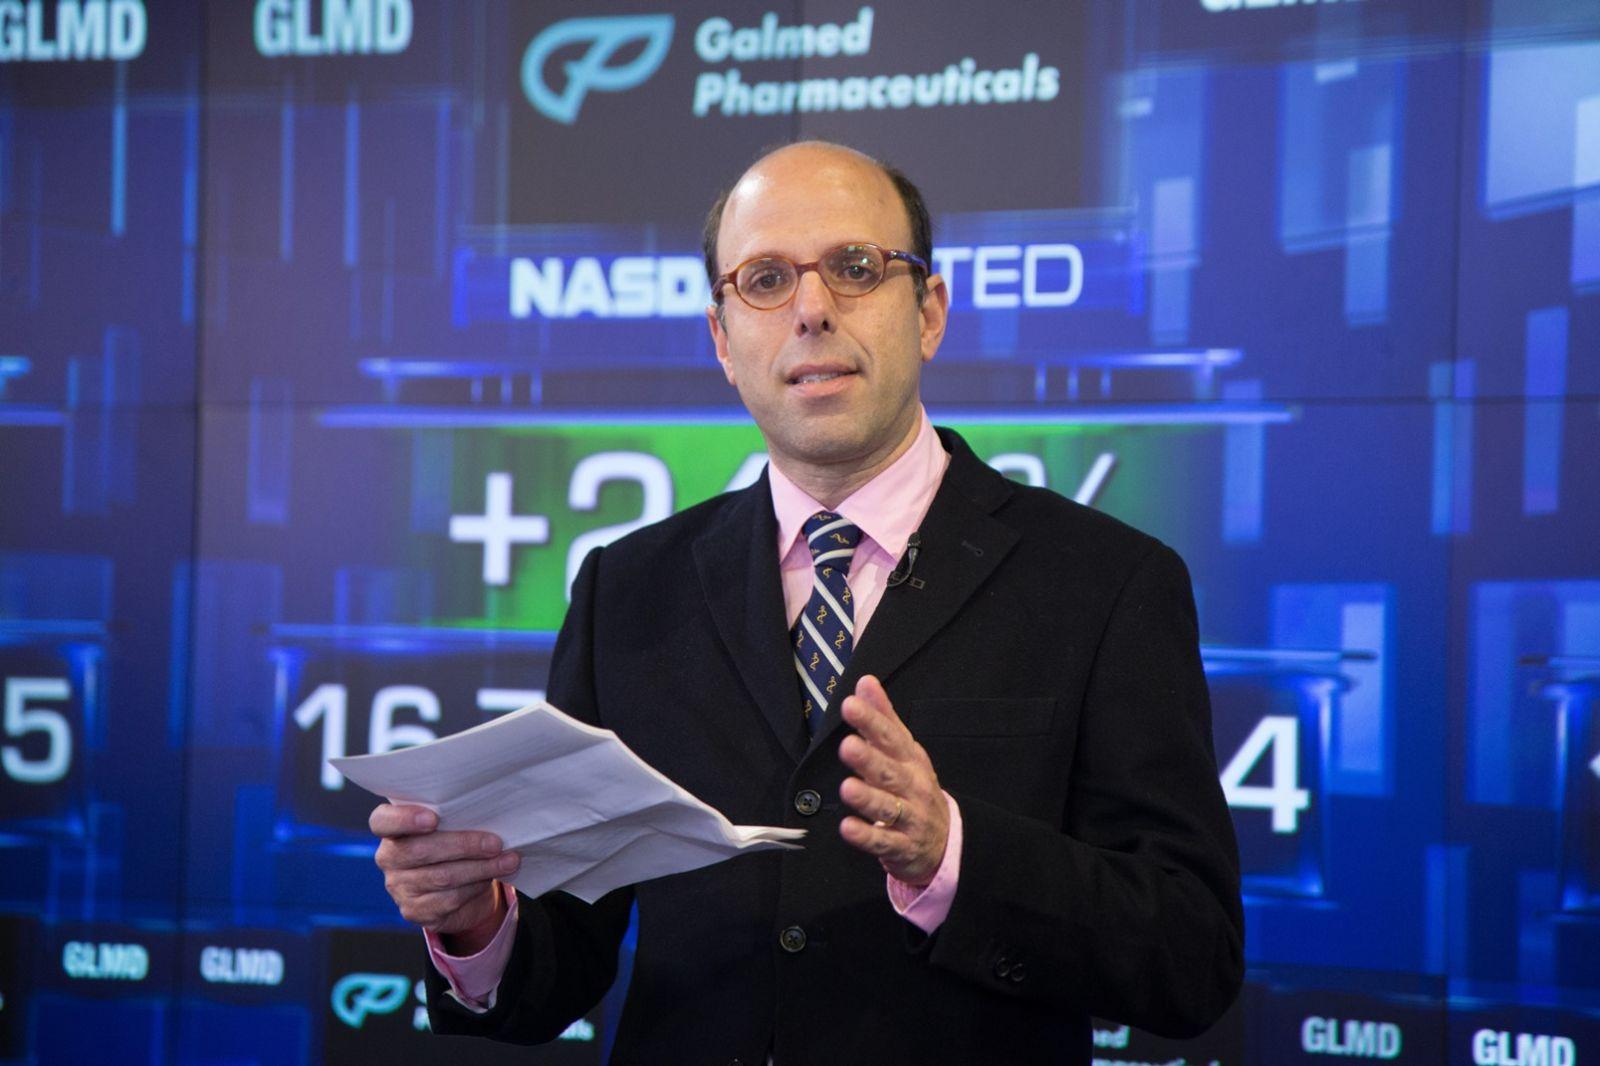 Galmed founder and CEO Allen Baharaff at NASDAQ on the day Galmed went public. Photo courtesy of NASDAQ